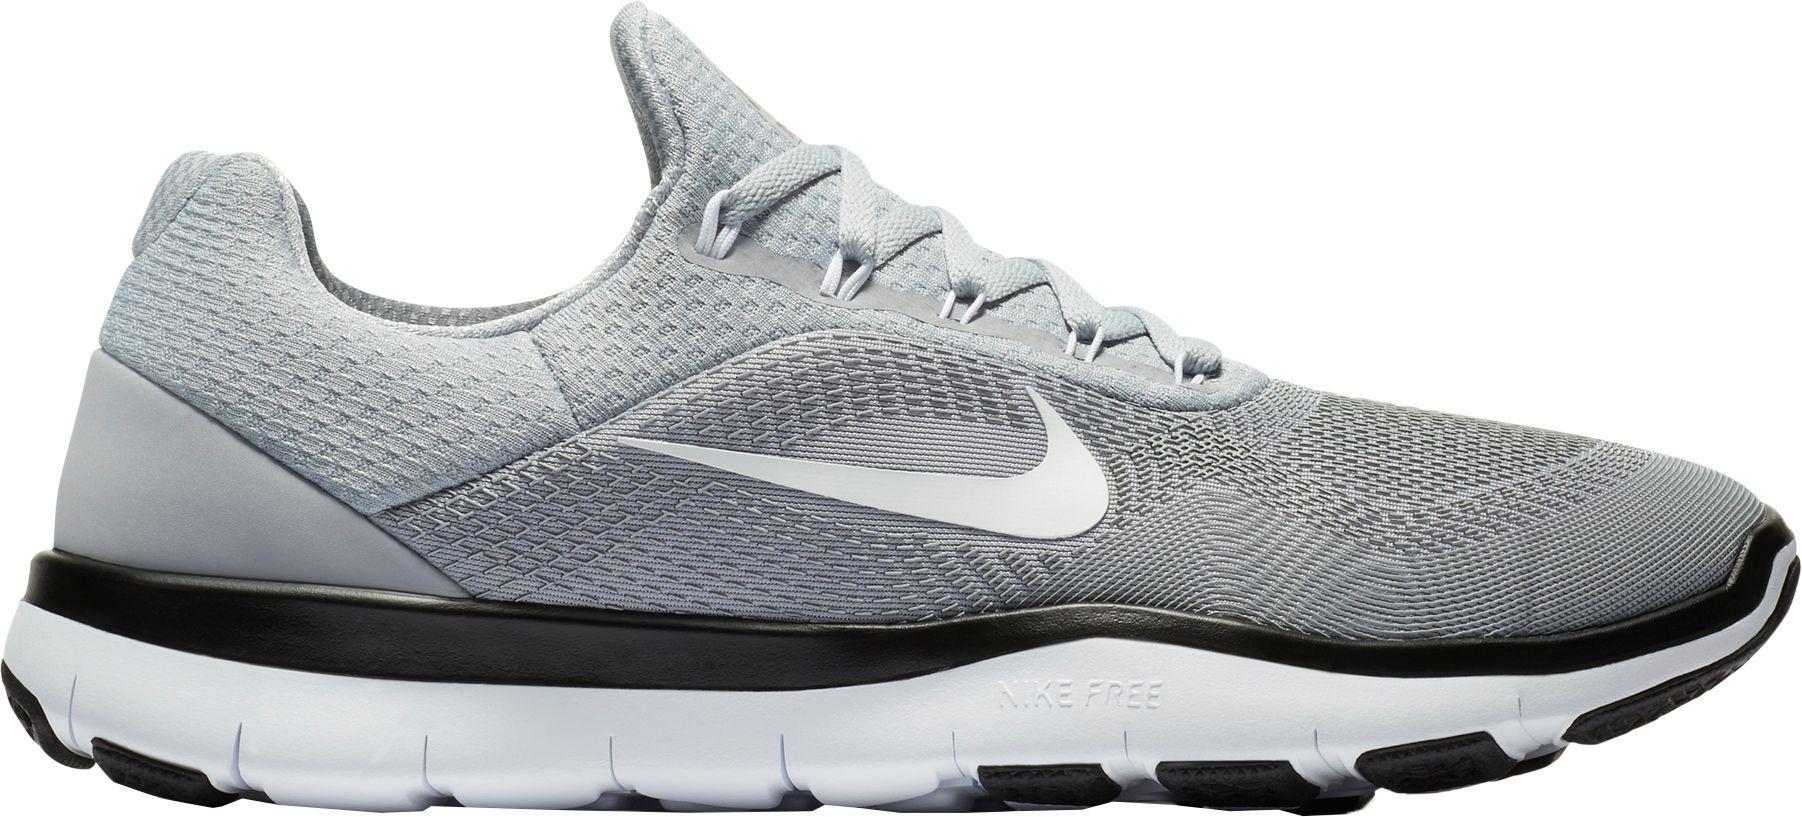 Nike Entraîneur Des Hommes Sans Chaussures De Formation V7 Tb